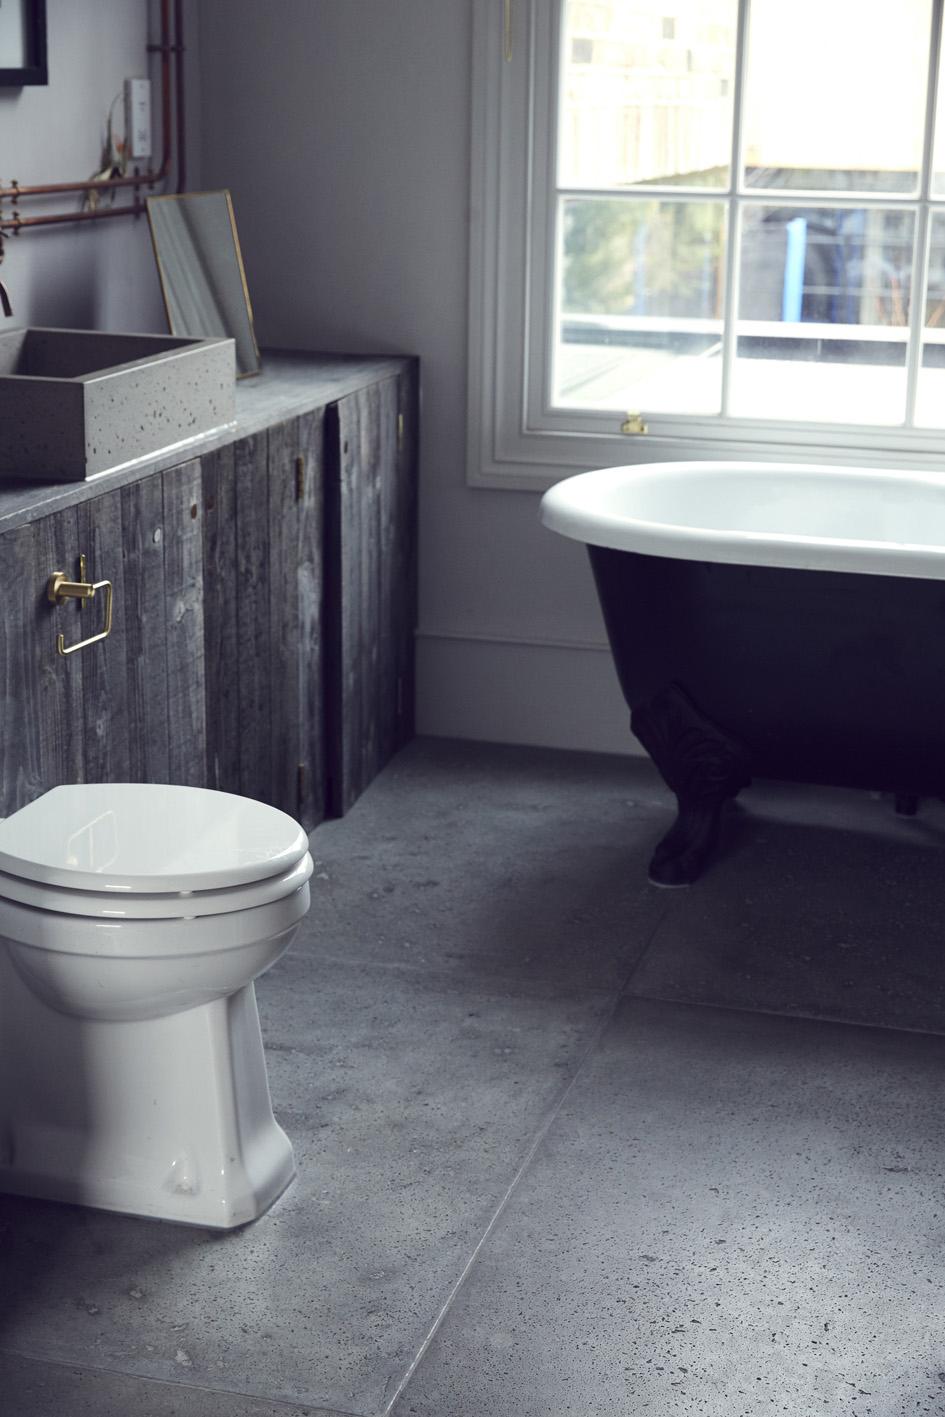 Concrete-sink-tiles-bathroom.jpg